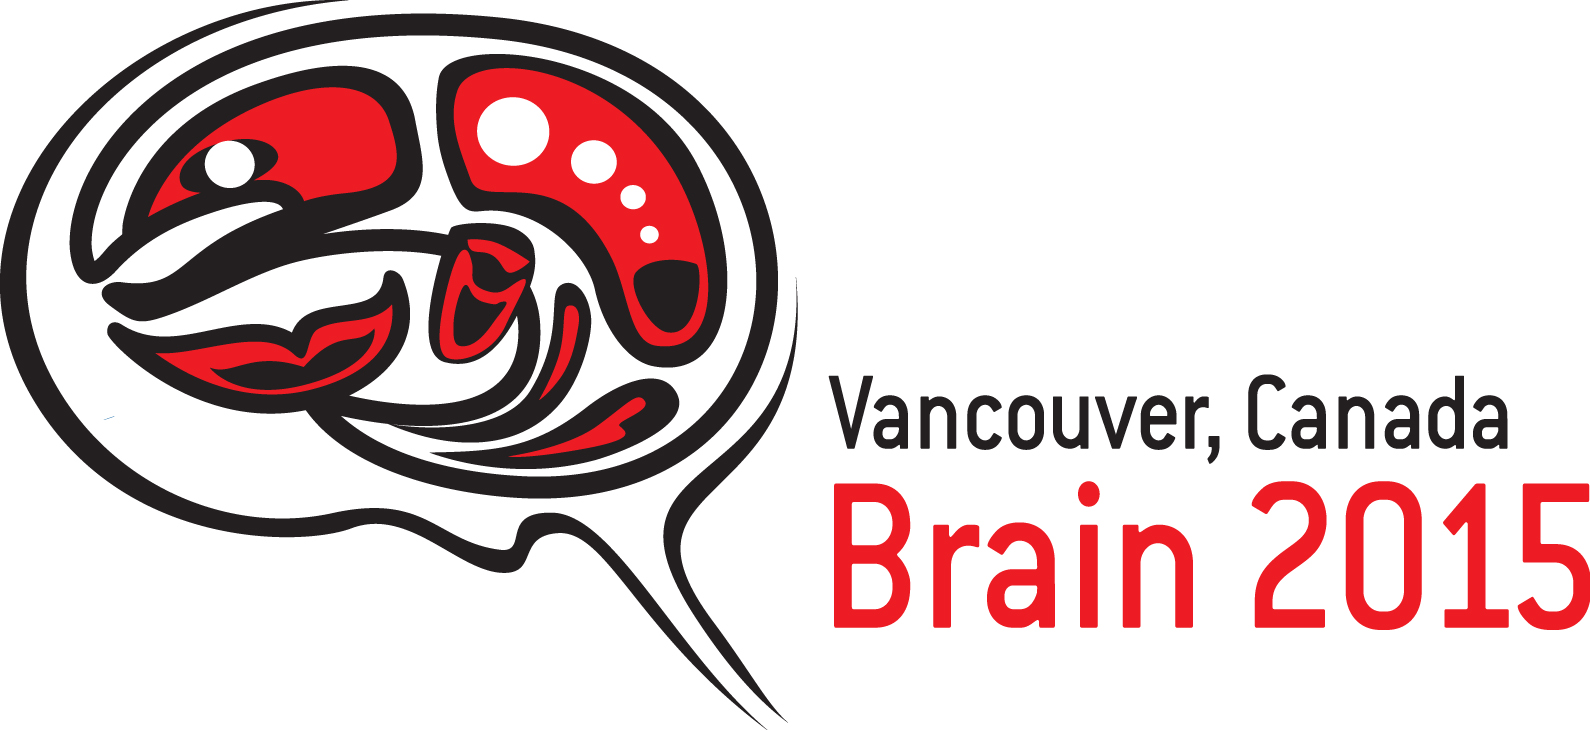 BRAIN 2015 logo